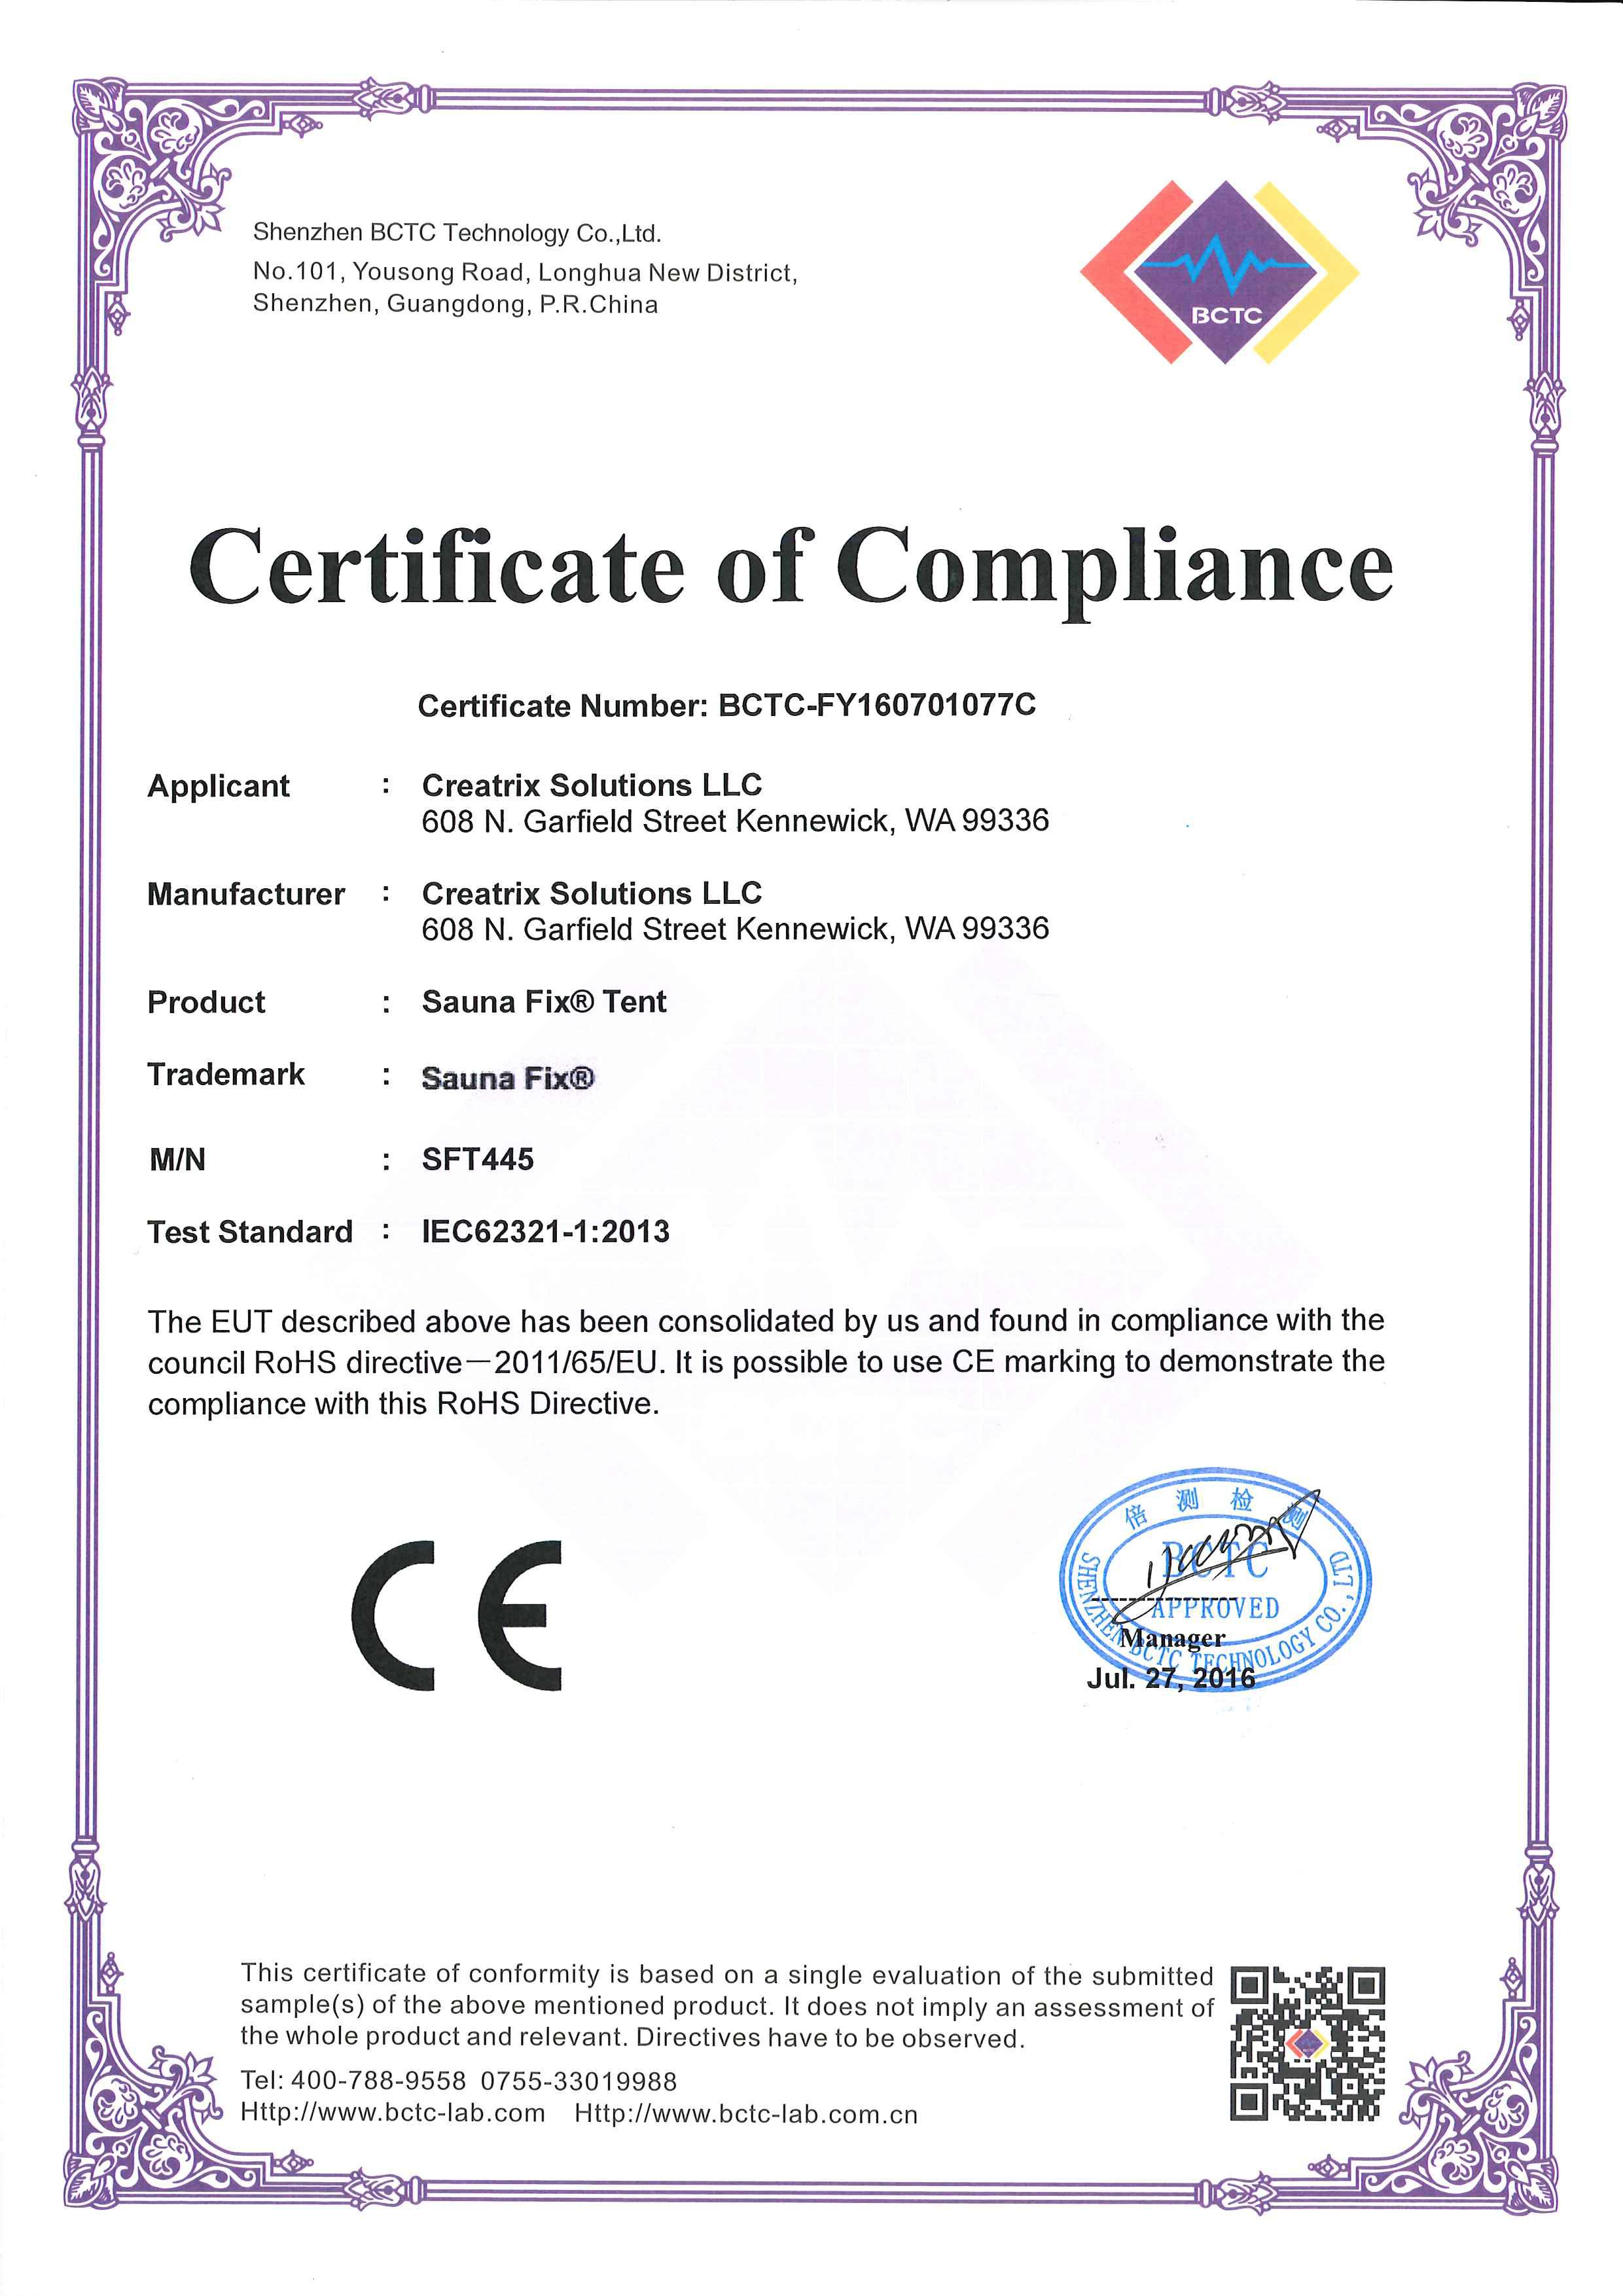 sauna-fix-tent-certificate-of-compliance.png